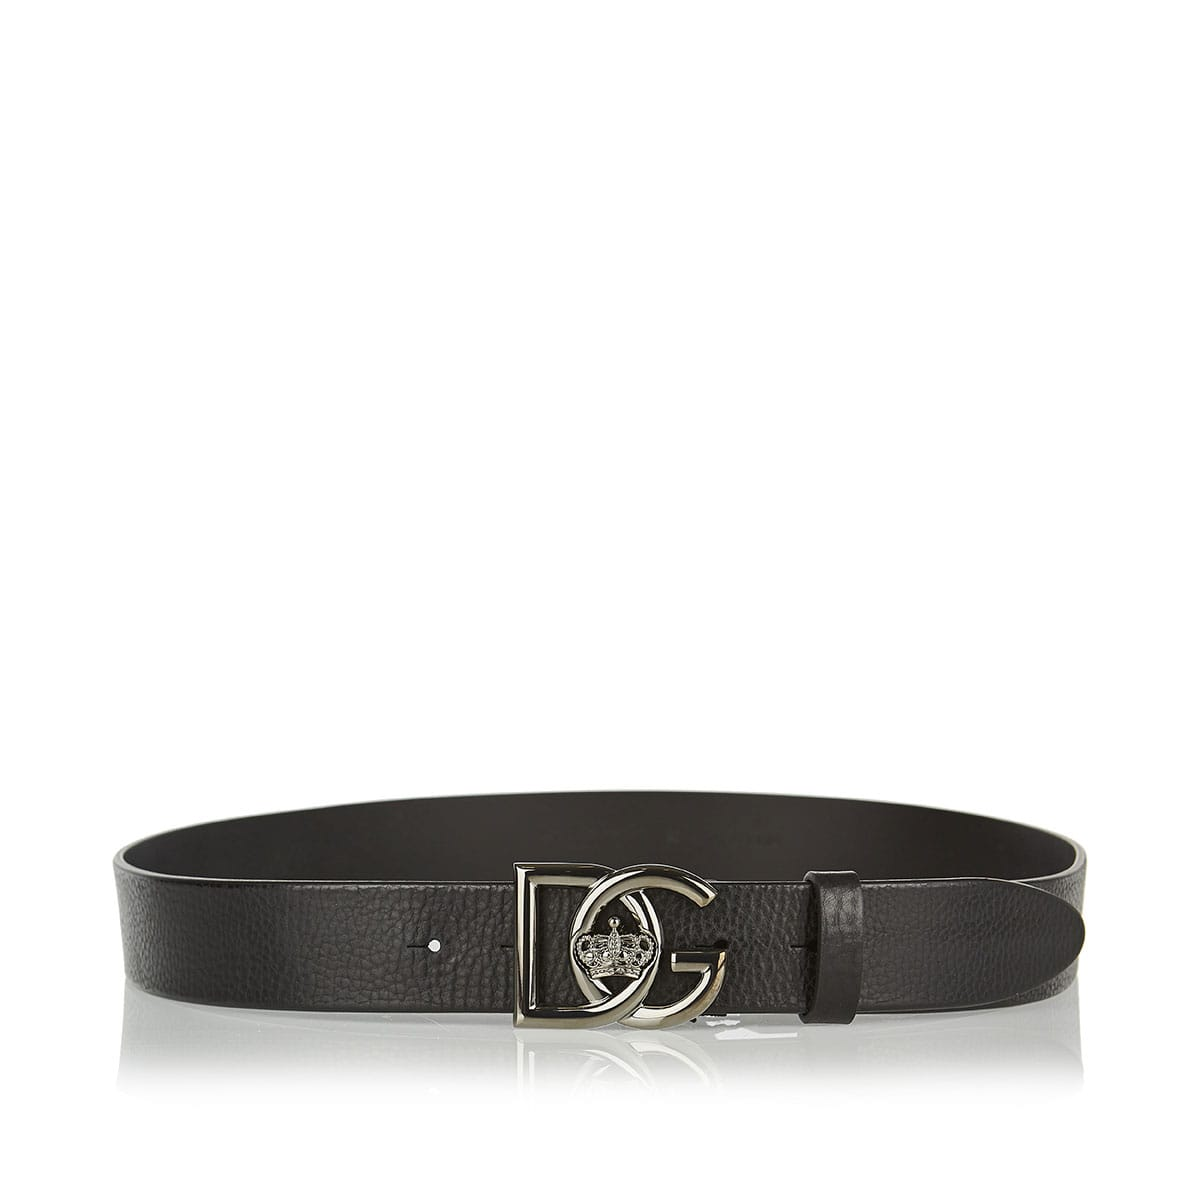 DG logo leather belt